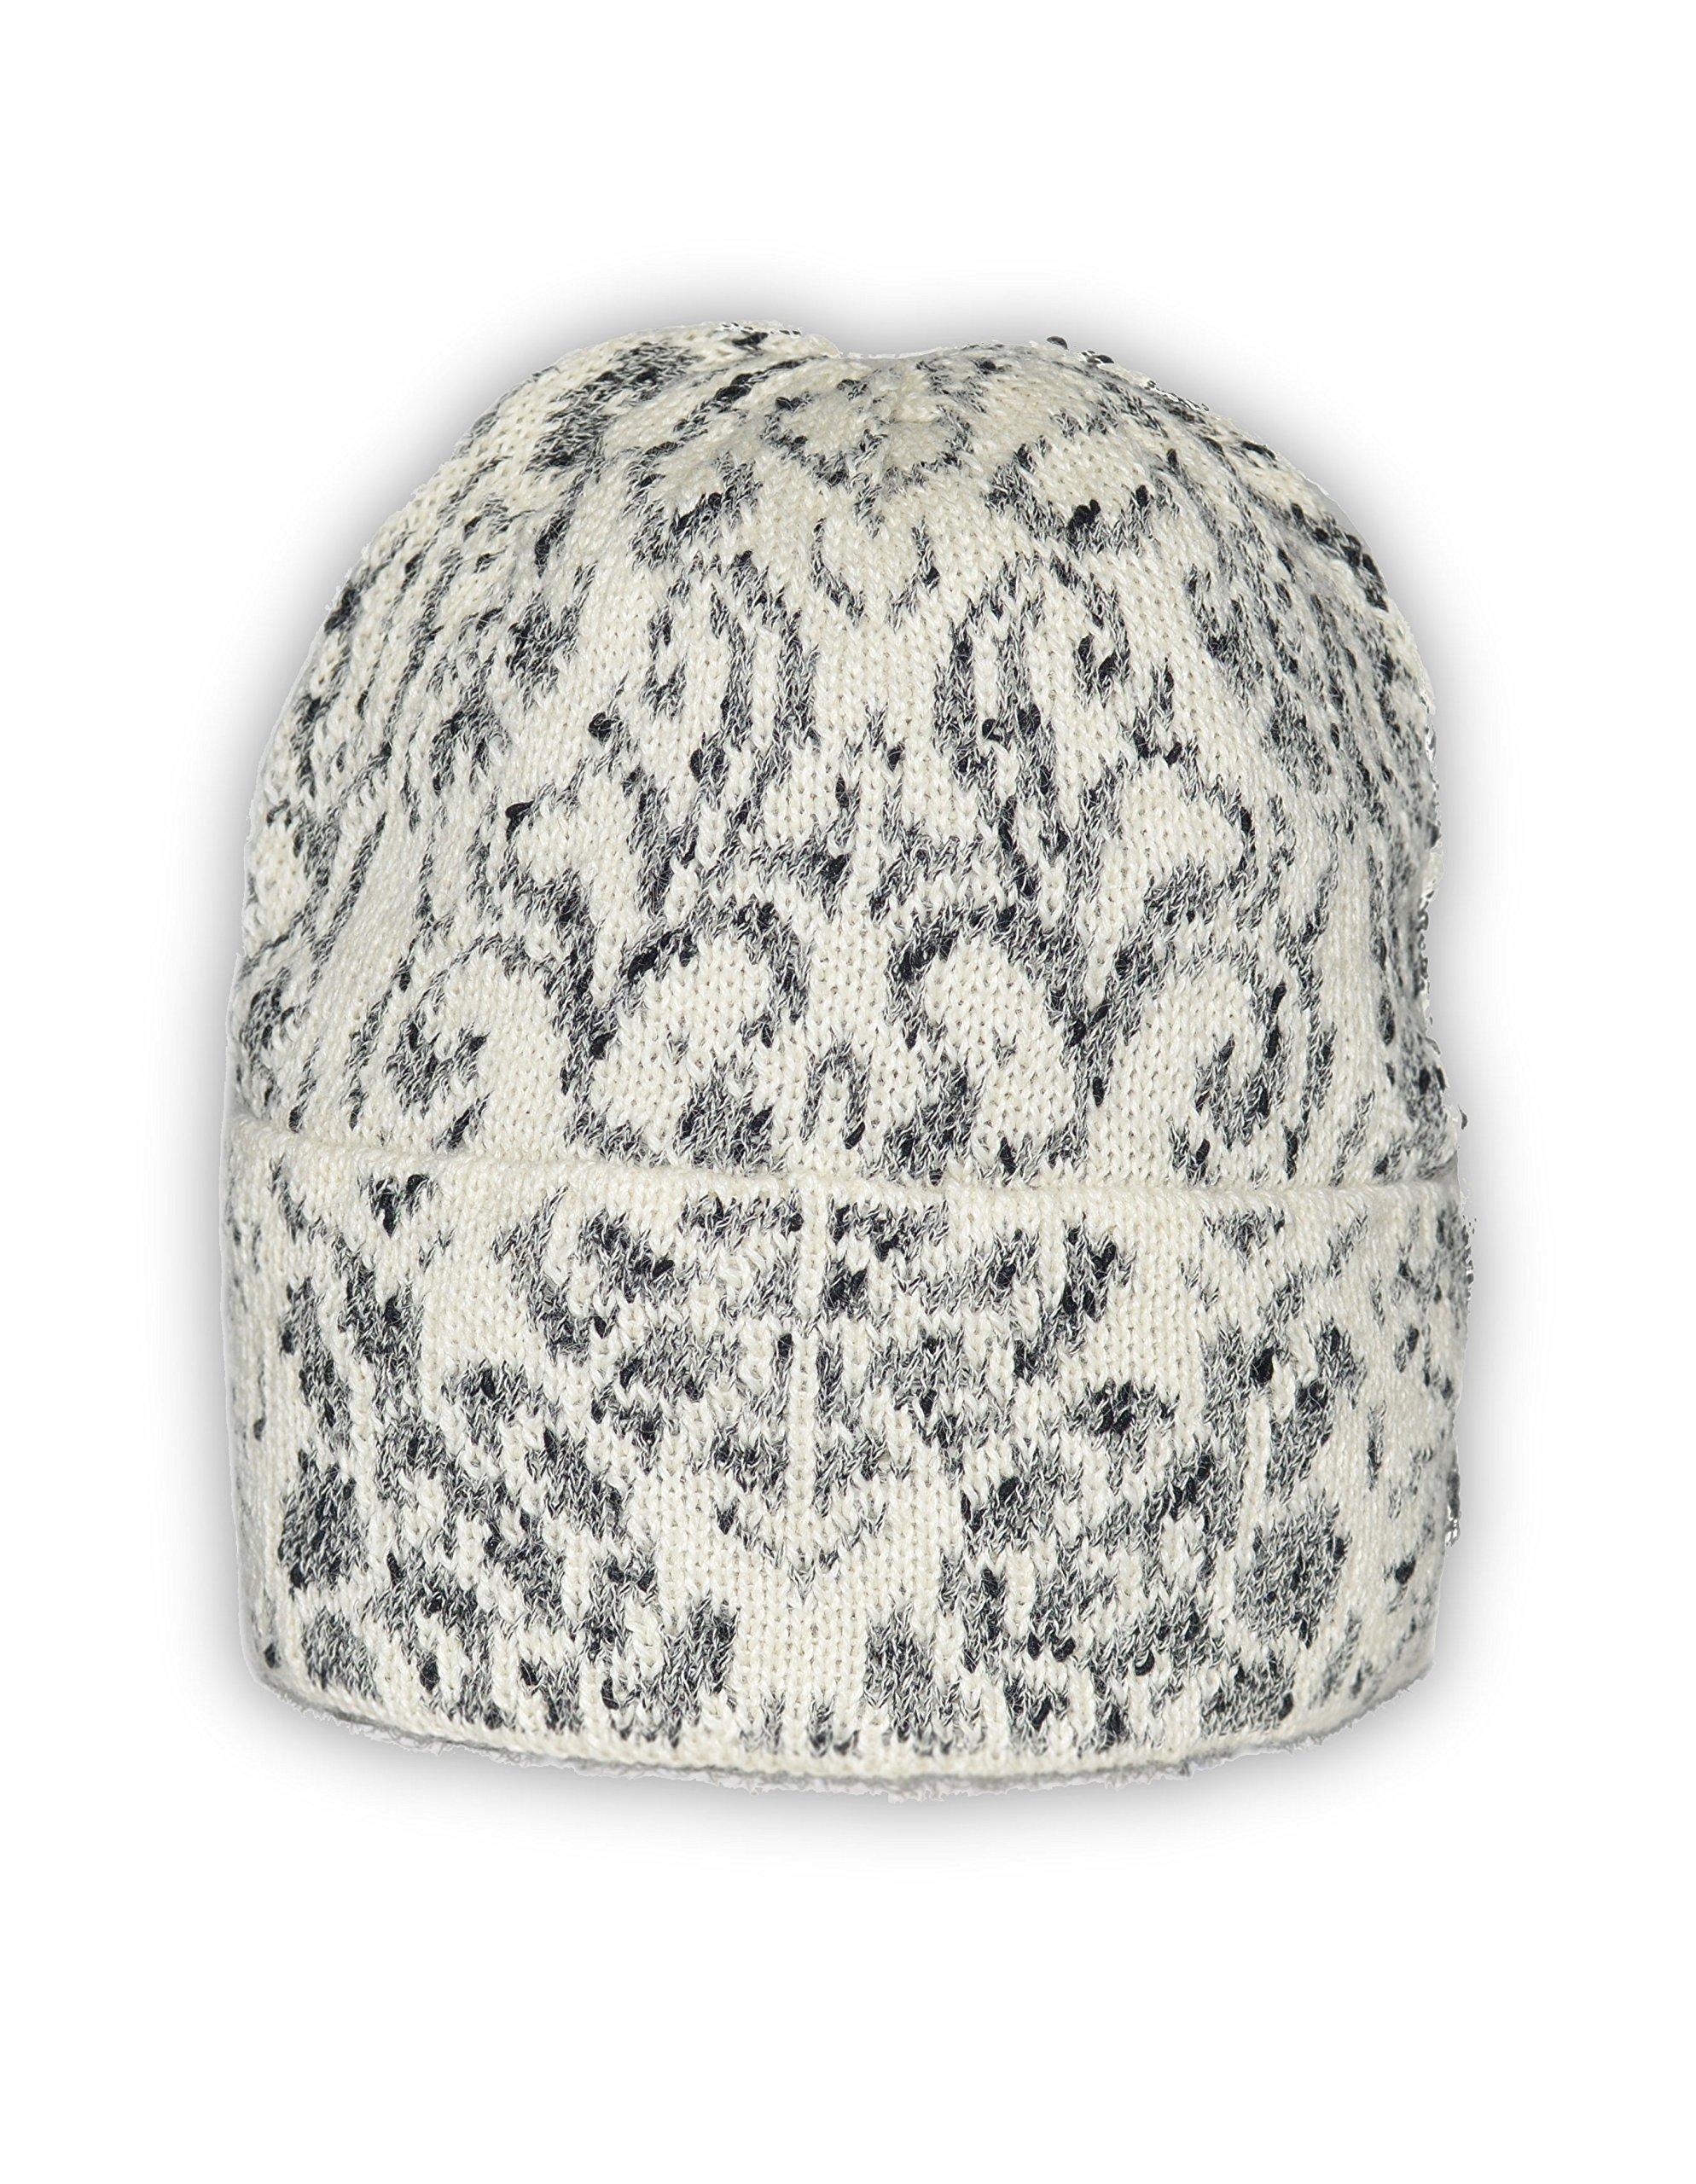 Invisible World Women's 100% Alpaca Wool Hat Knit Unisex Beanie Winter Oxa Md